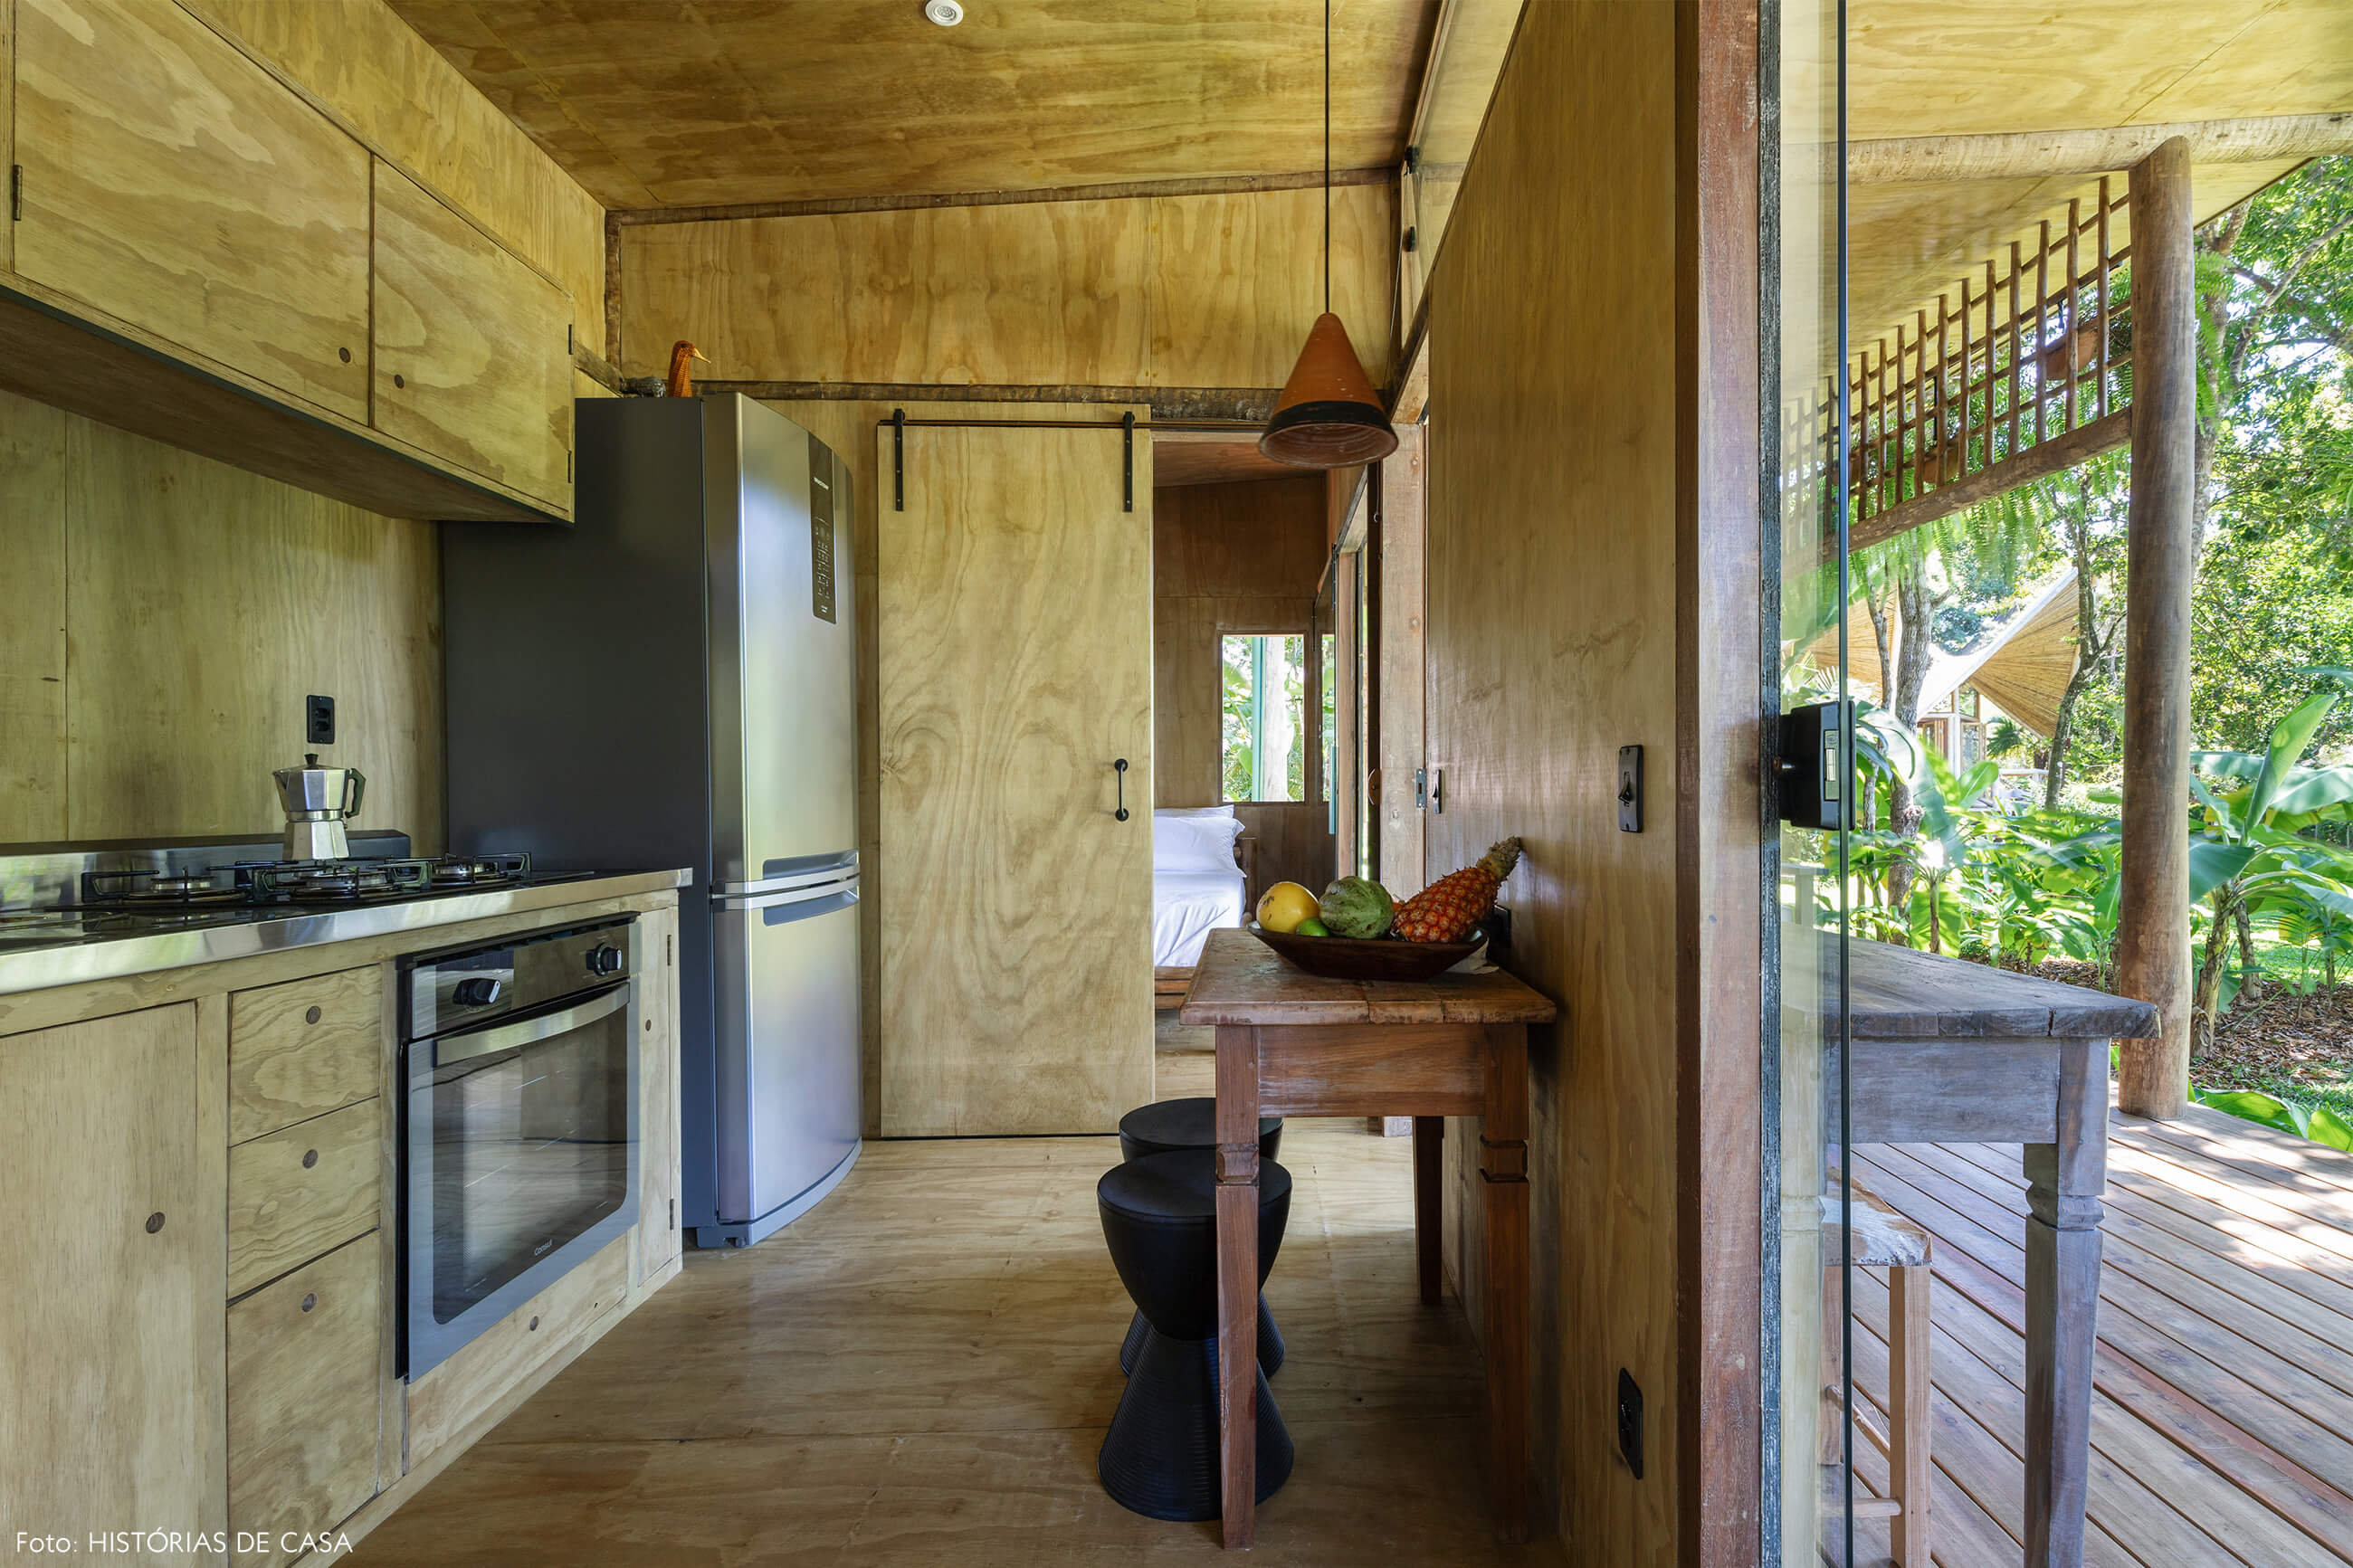 trancoso-decoracao-hotel-villase7e-27-cozinha-bancos-pretos-mesa-madeira-cafeteira-italiana-luminaria-laranja